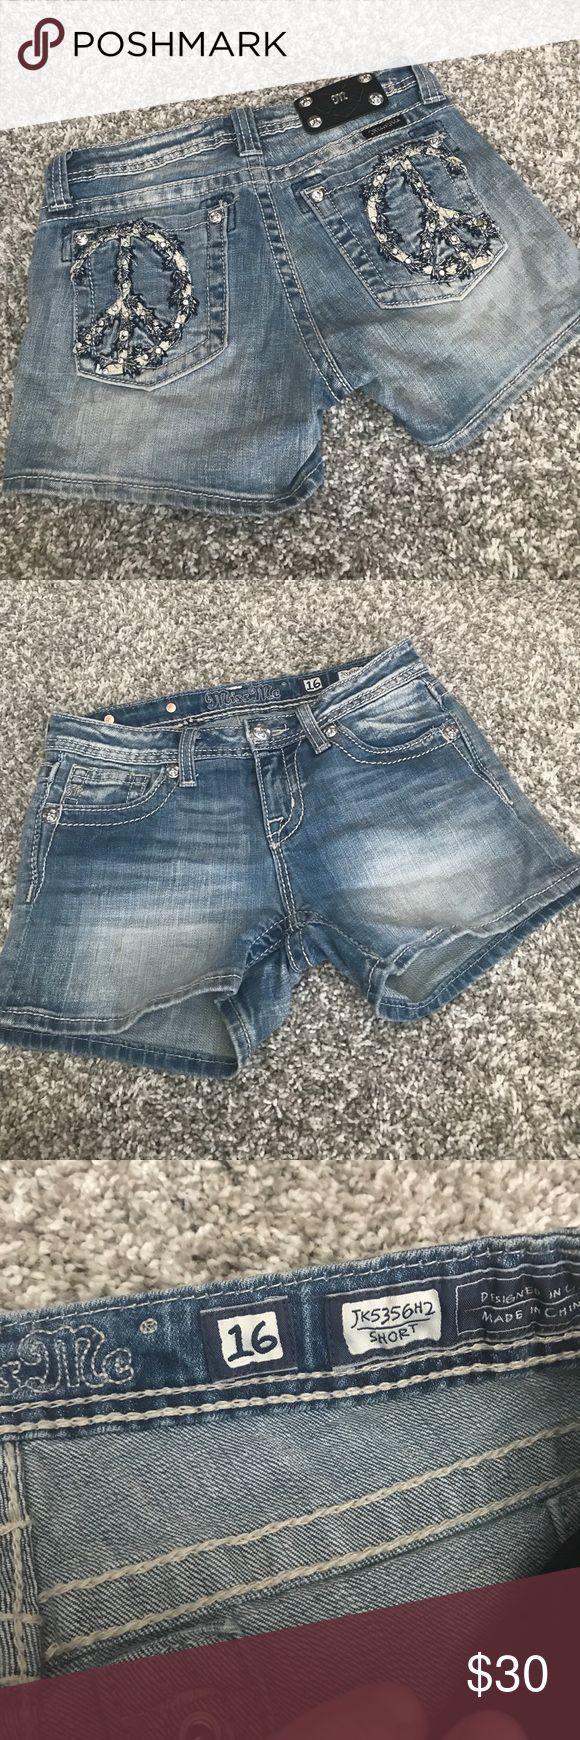 Girls miss me jean shorts sz 16 Girls miss me shorts sz 16 like new worn twice . Look amazing can fit women's I think miss me Shorts